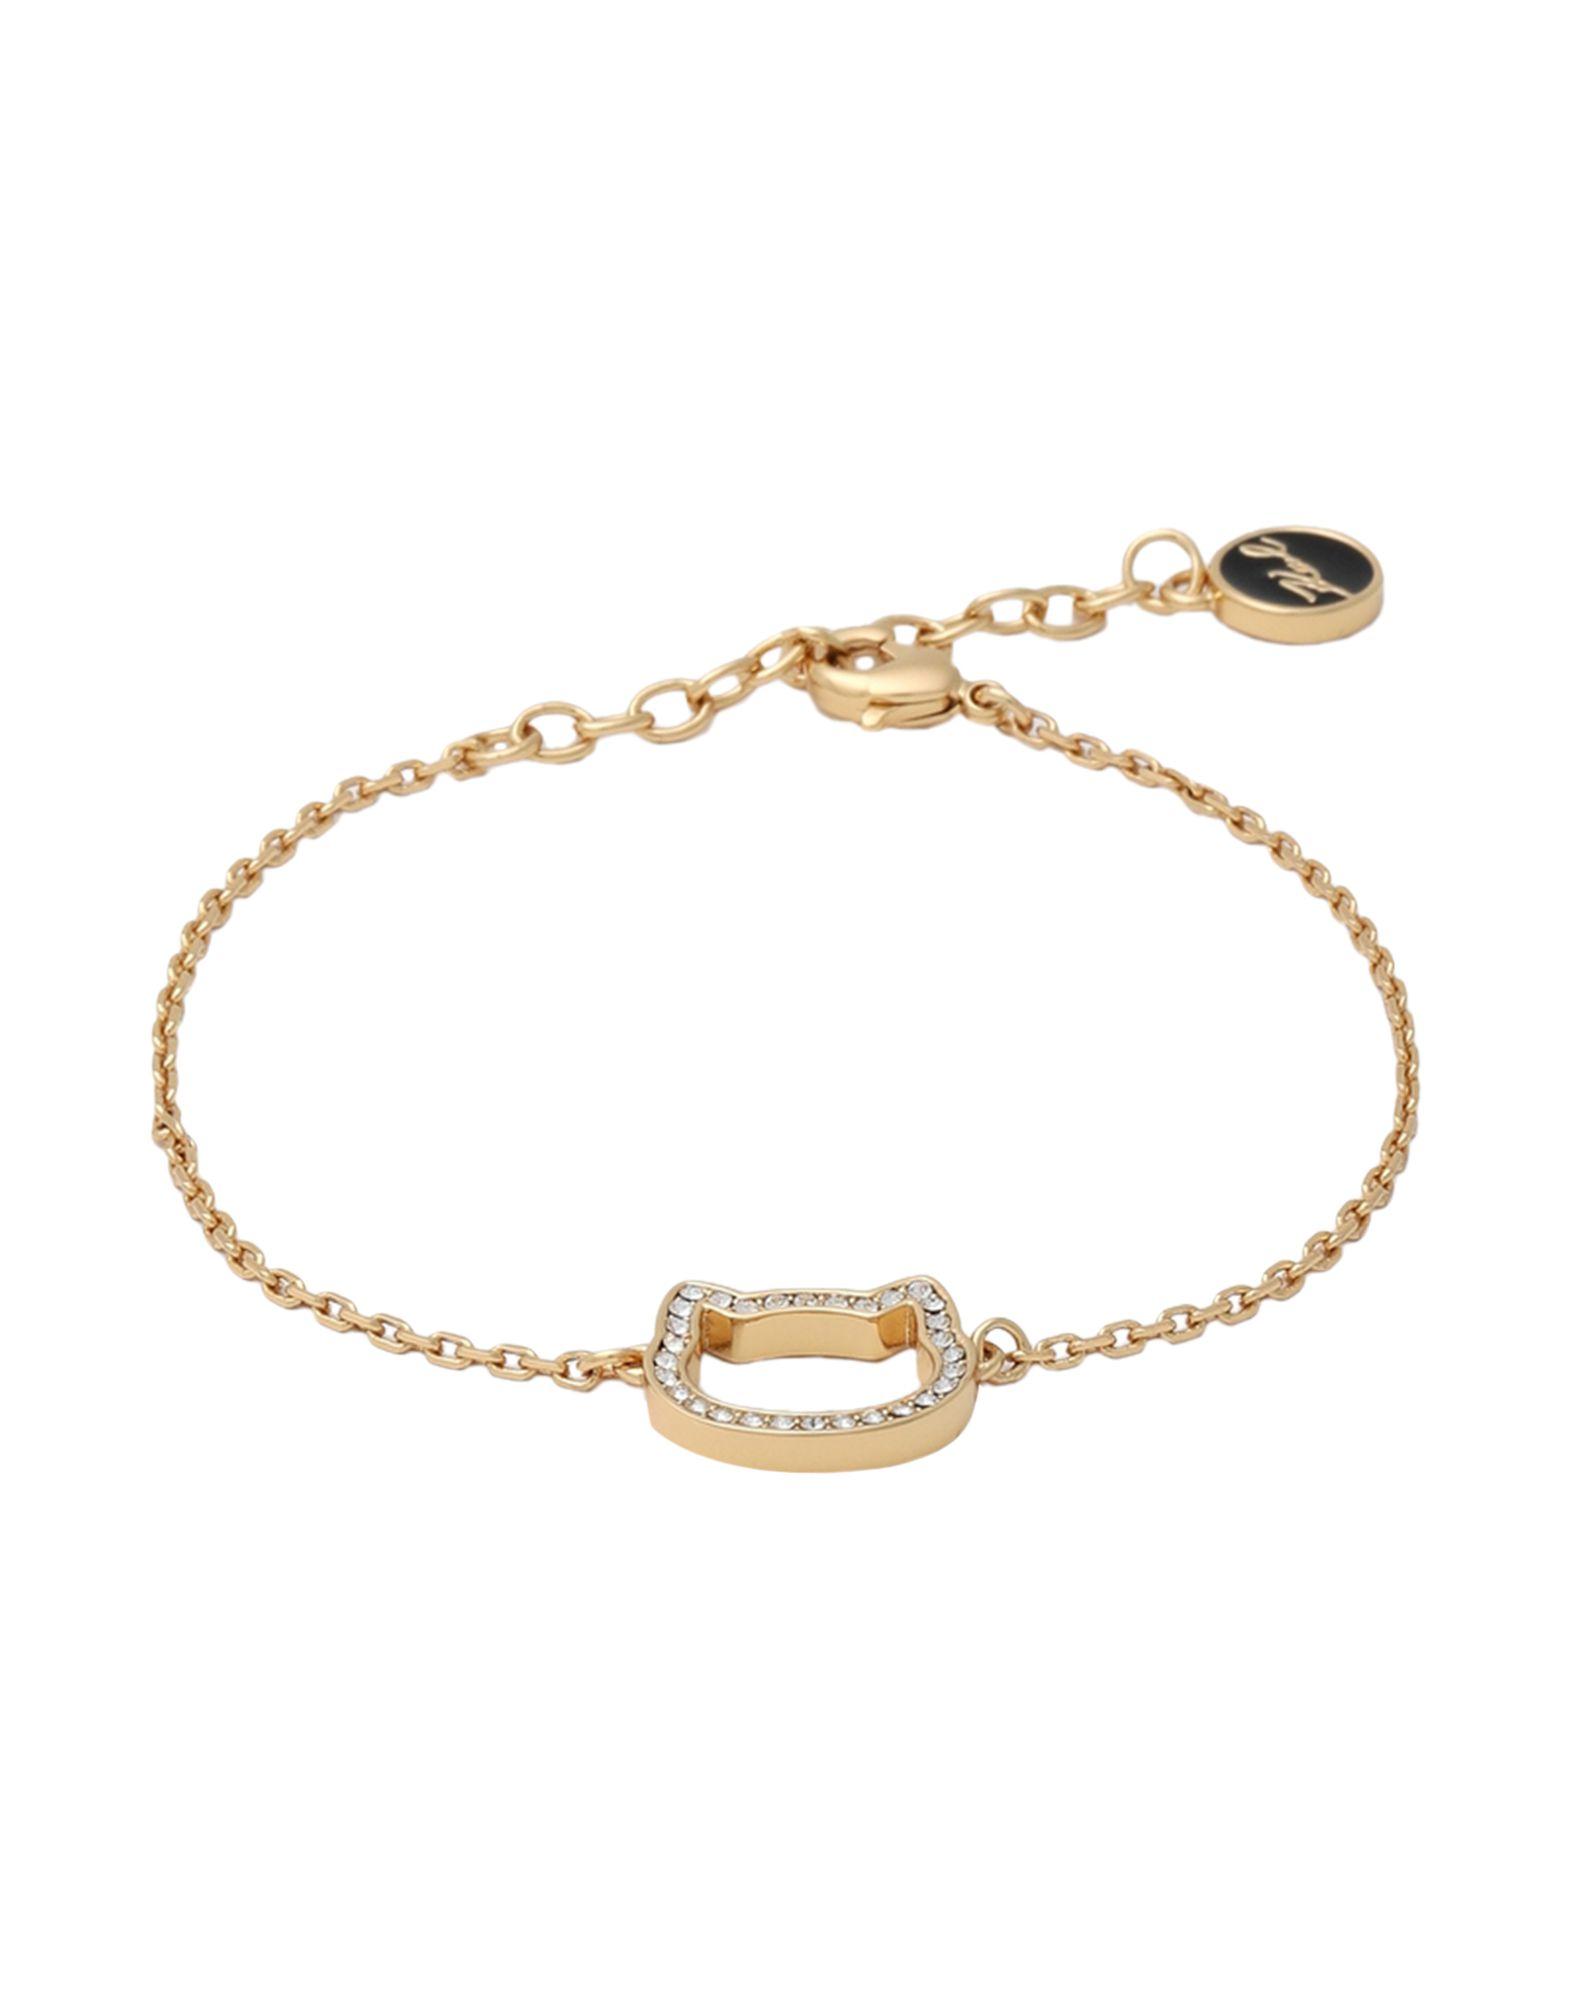 KARL LAGERFELD Bracelets - Item 50237814